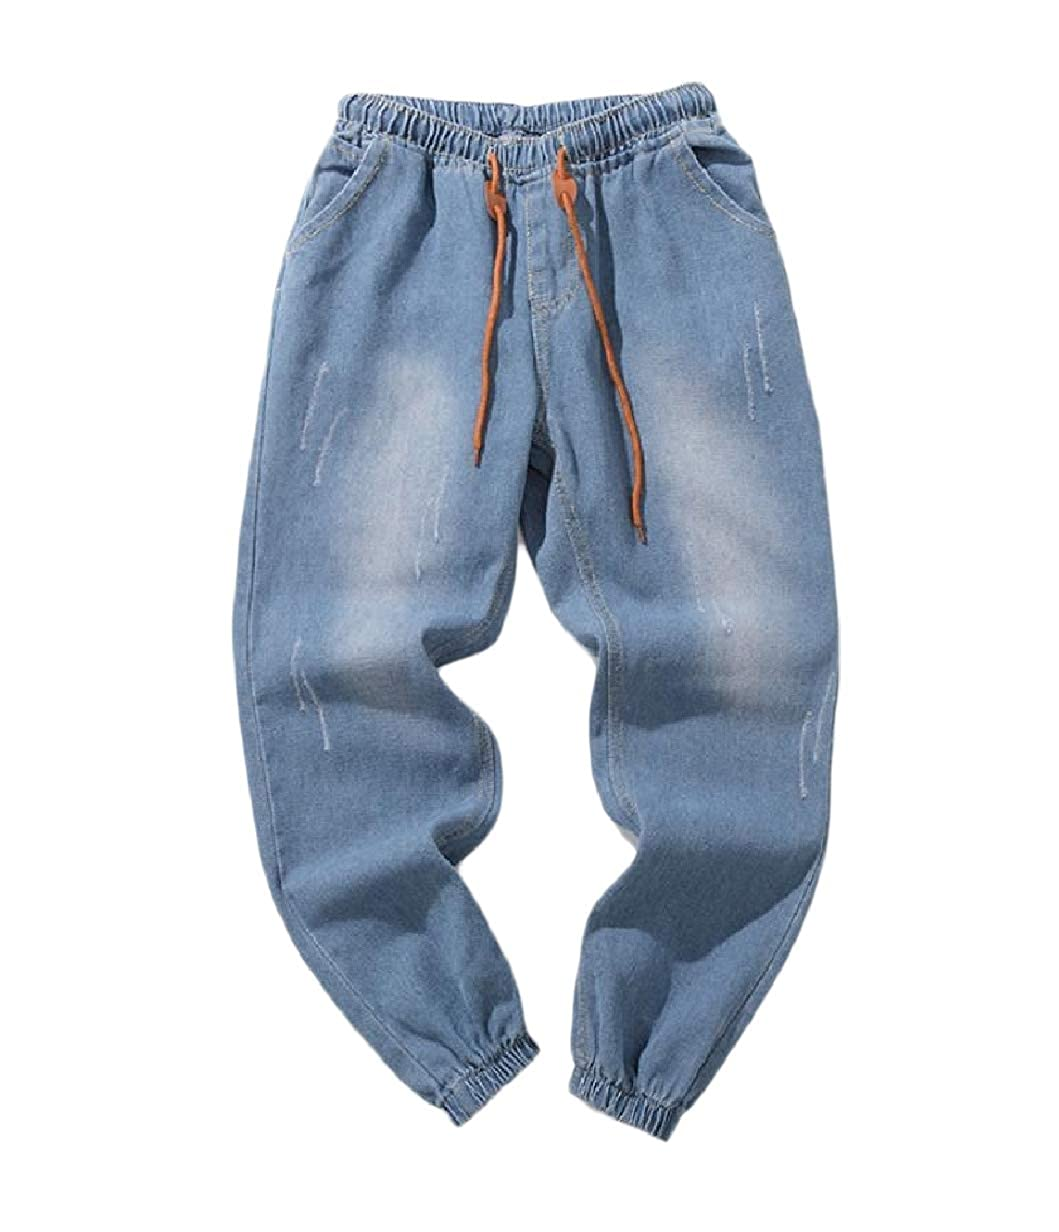 VITryst-Men Elastic Drawstring Rugged Wear Denim Washed Plus-Size Jeans